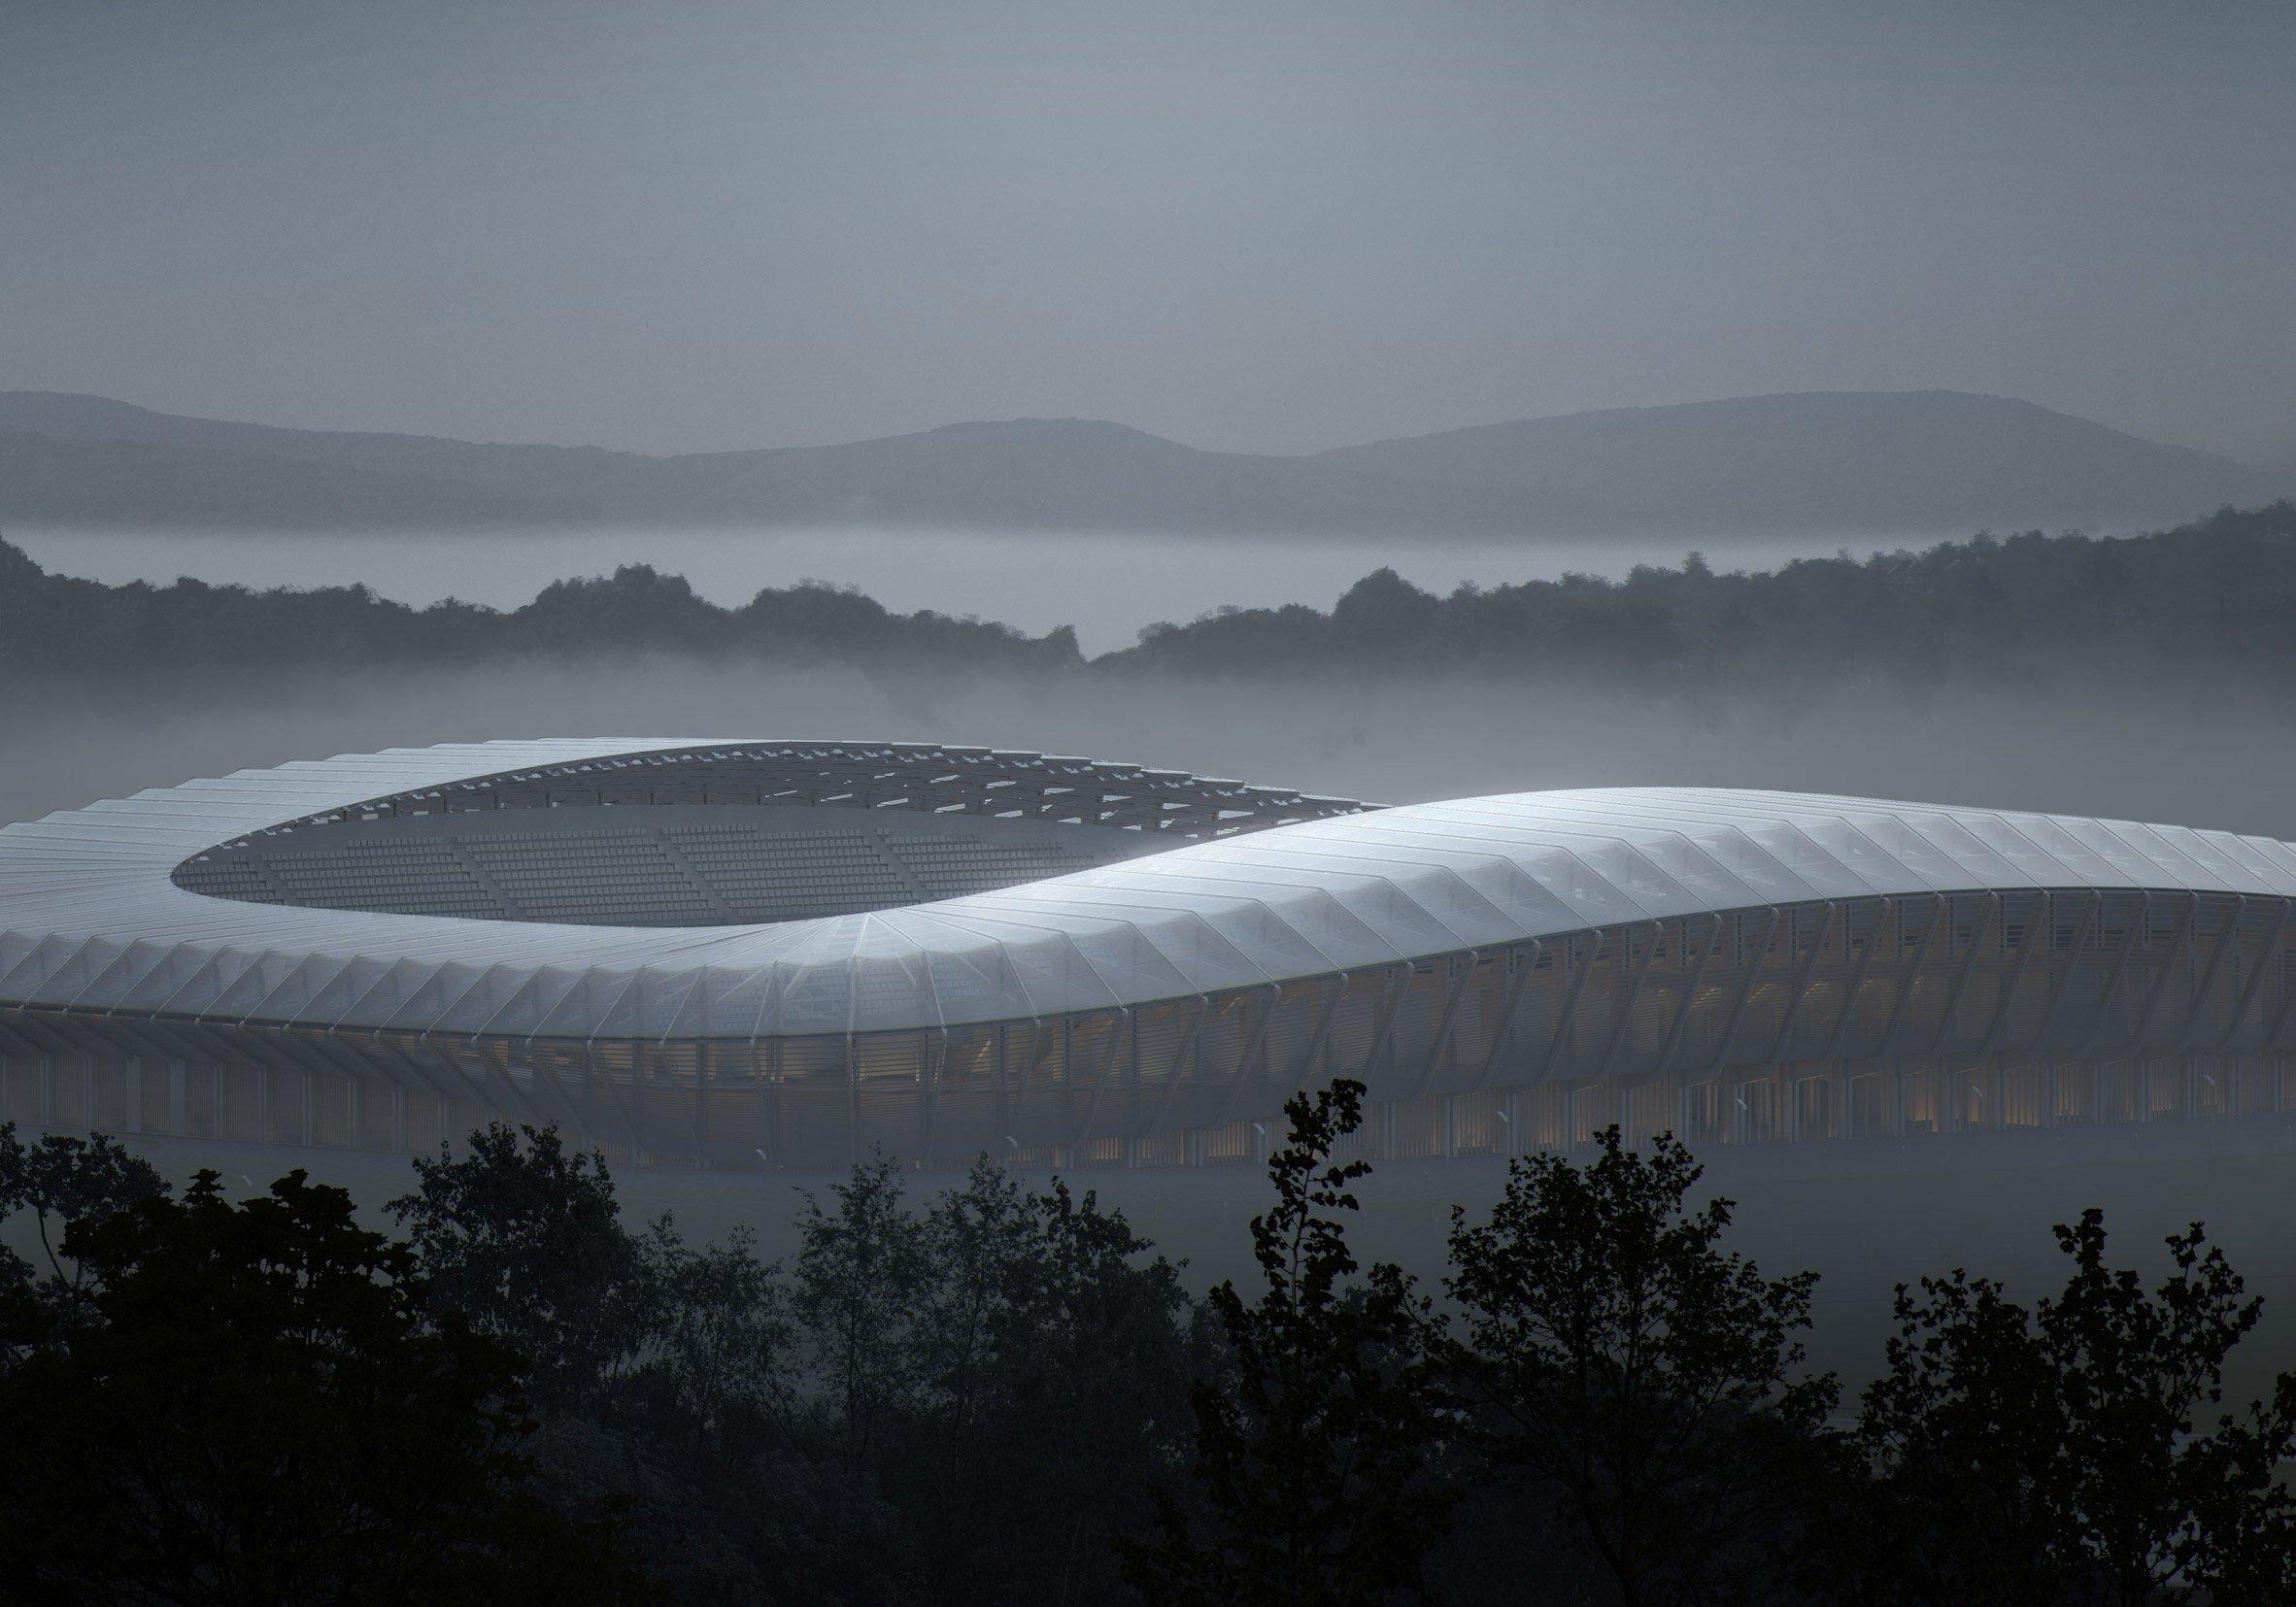 forest-green-rovers-eco-park-football-soccer-stadium-architecture-news-zaha-hadid-architects-stroud-gloucestershire-england-uk_dezeen_2364_col_5